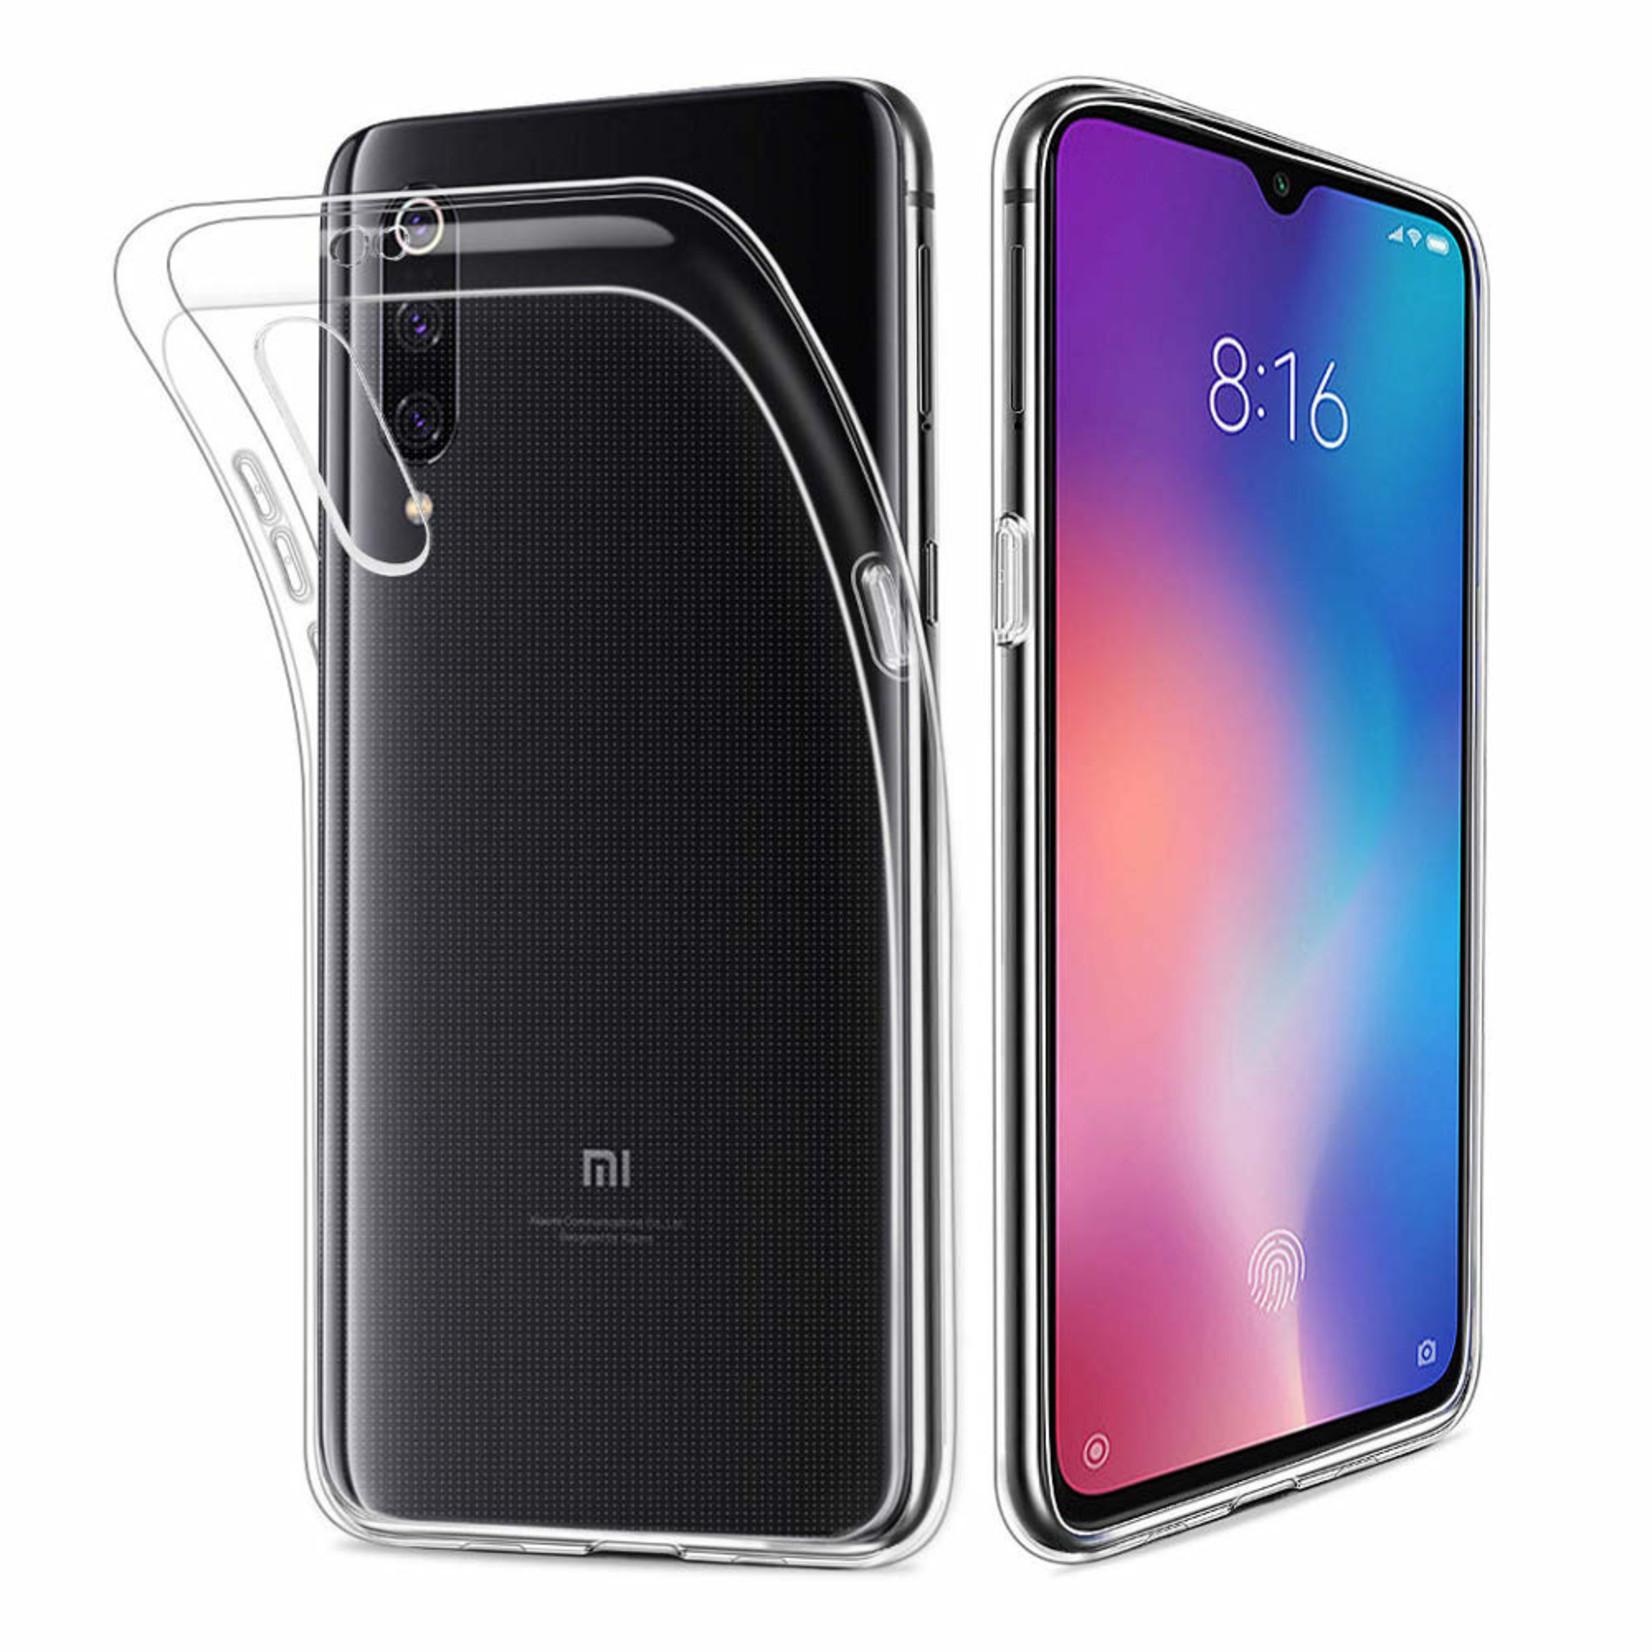 Colorfone Hoesje CoolSkin3T voor Xiaomi MI 9 Transparant Wit